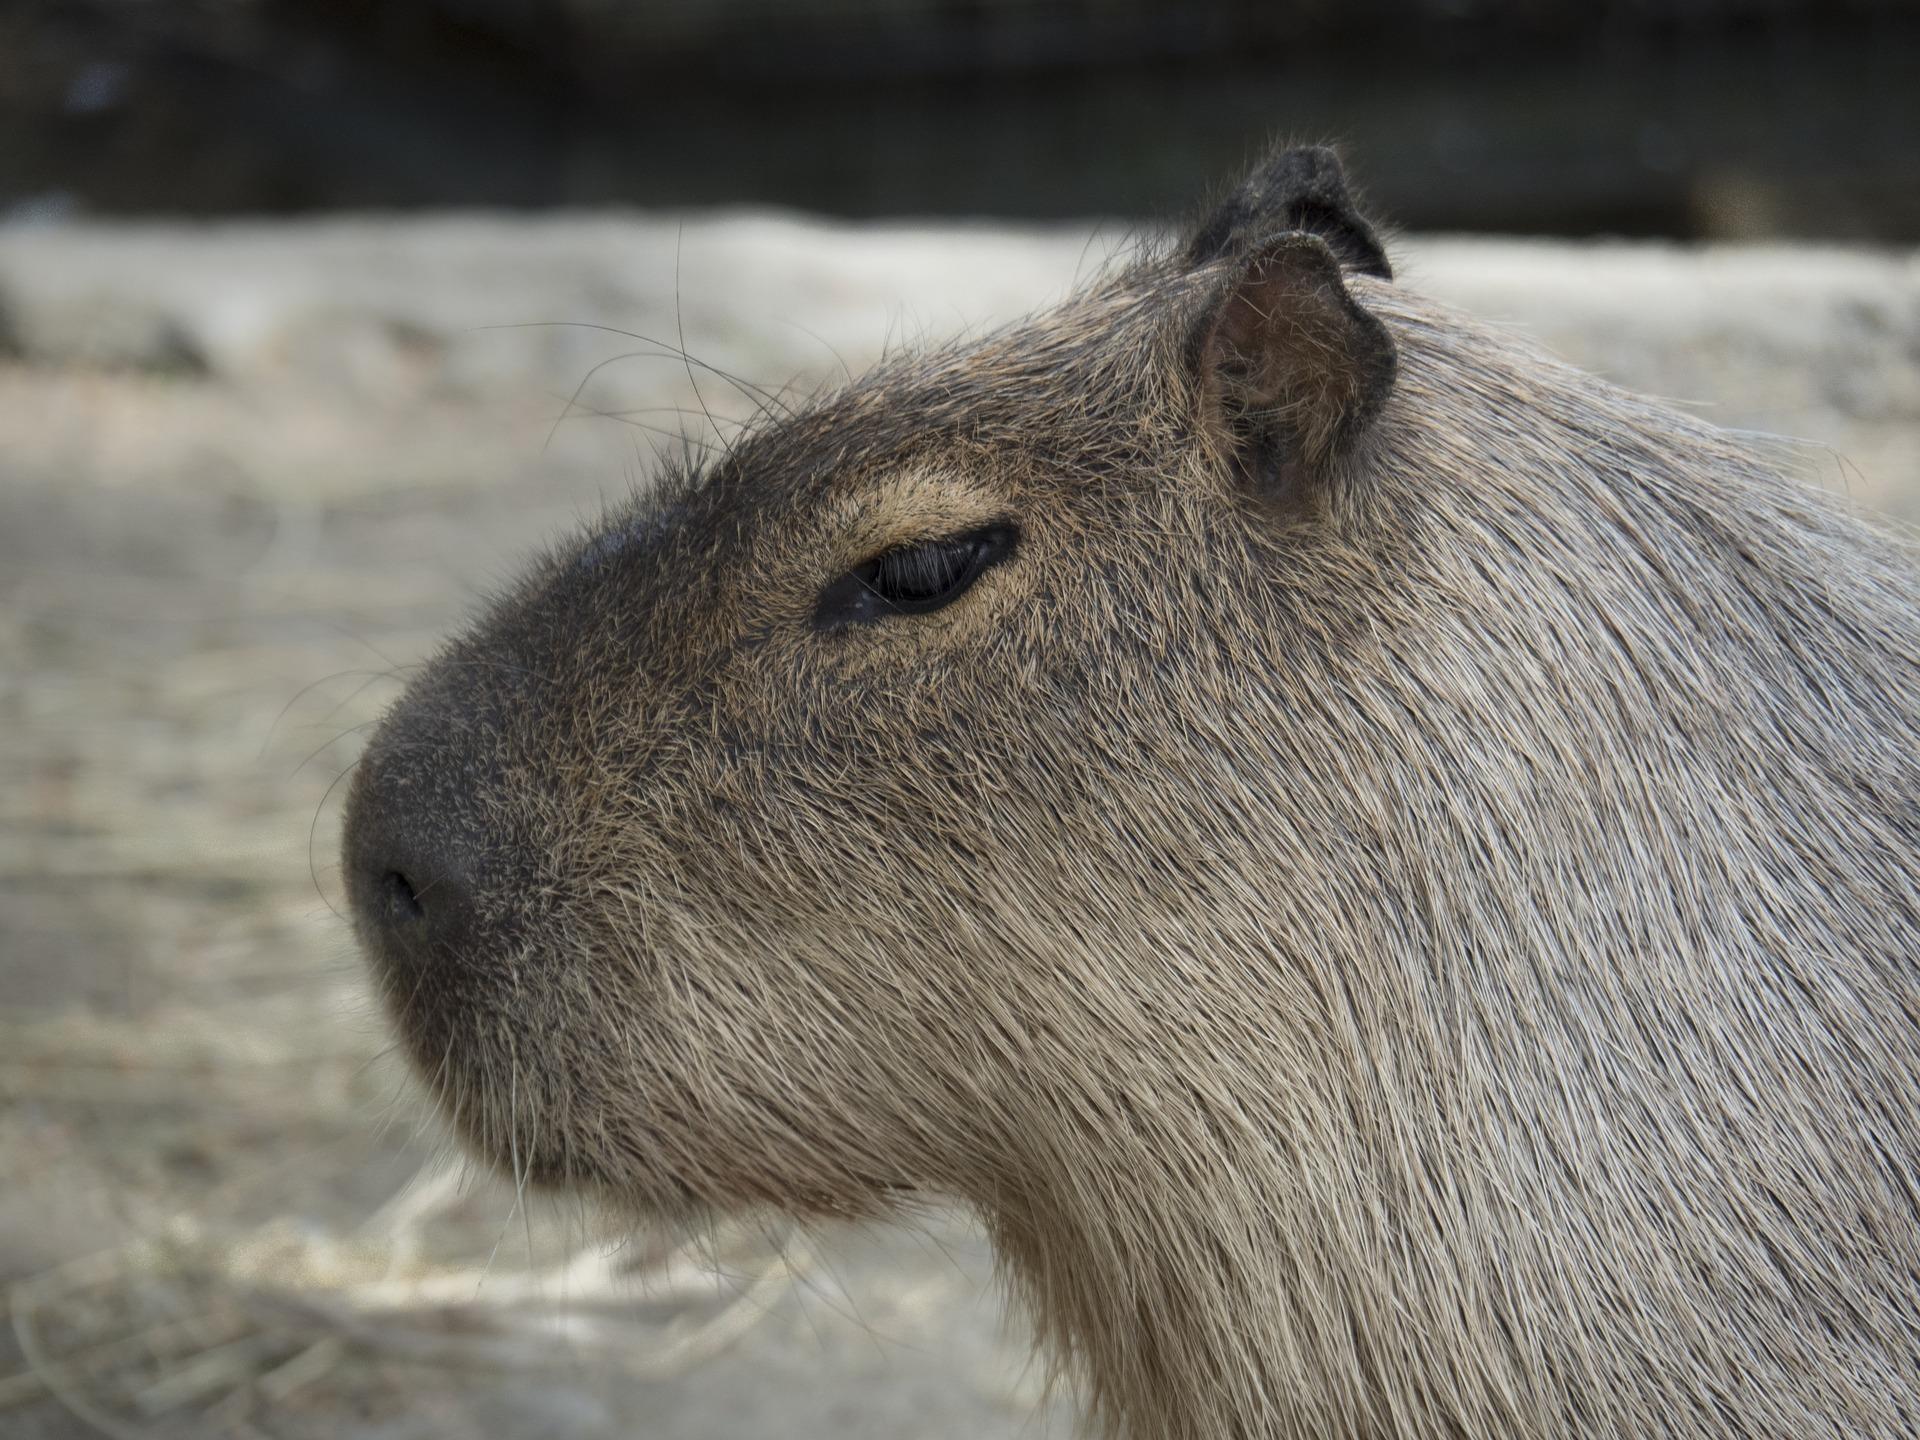 capybara-2235347_1920.jpg